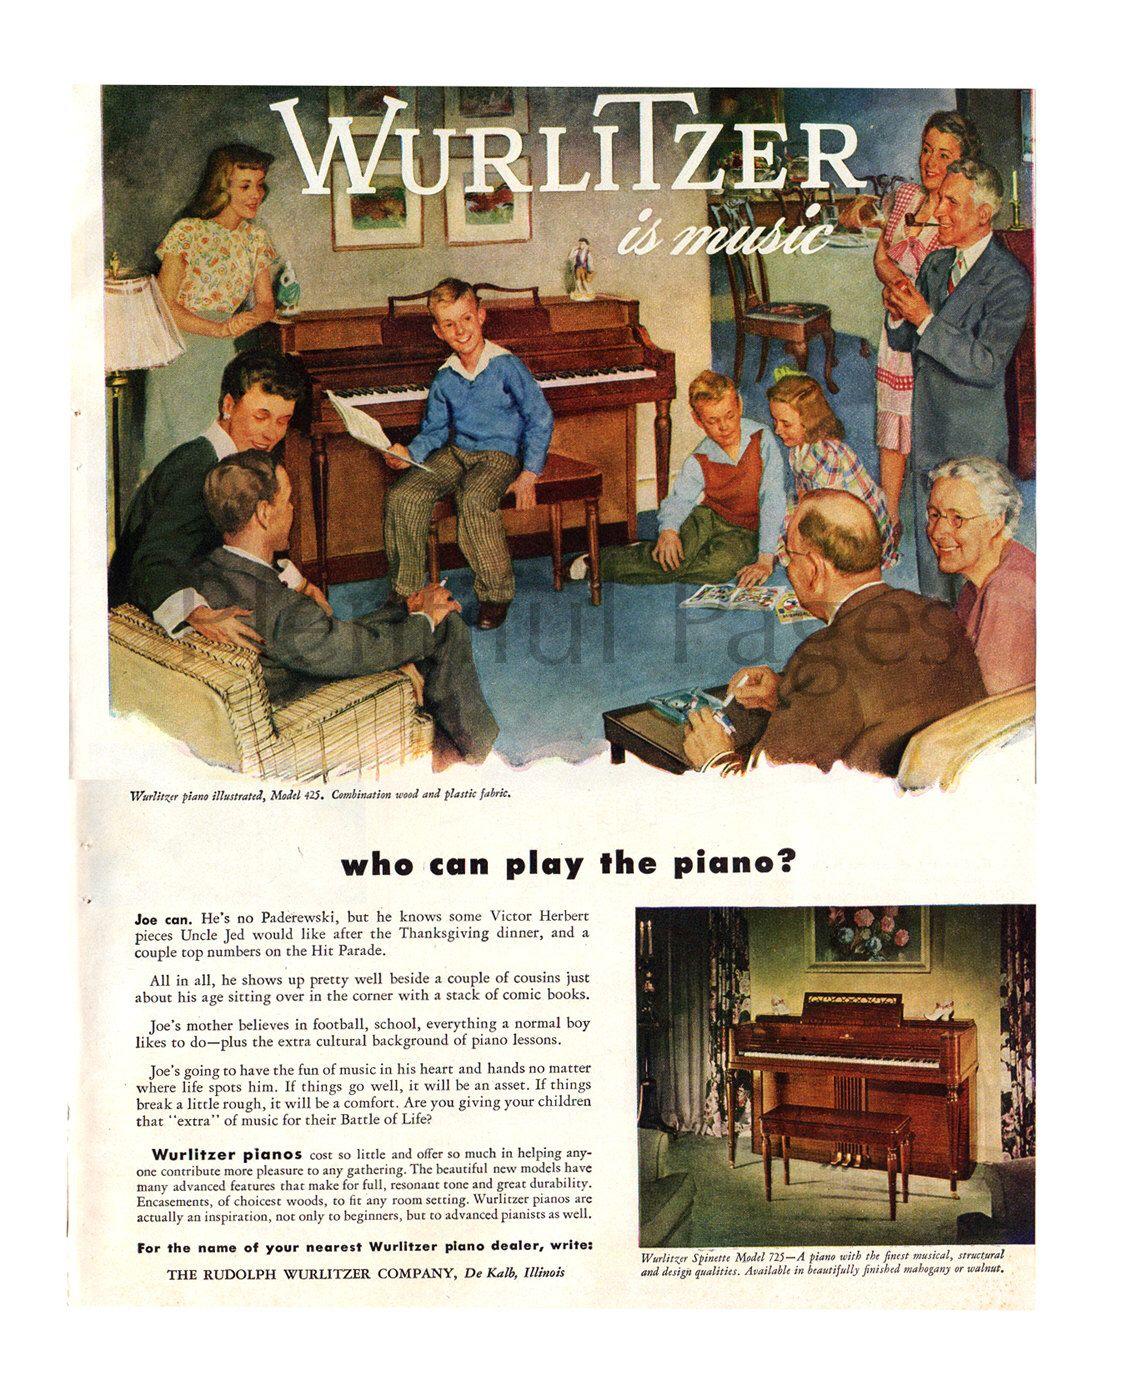 1947 Wurlitzer Piano Vintage Ad 1940 S Decor 1940 S Etsy Vintage Illustration Vintage Ads 1940s Decor